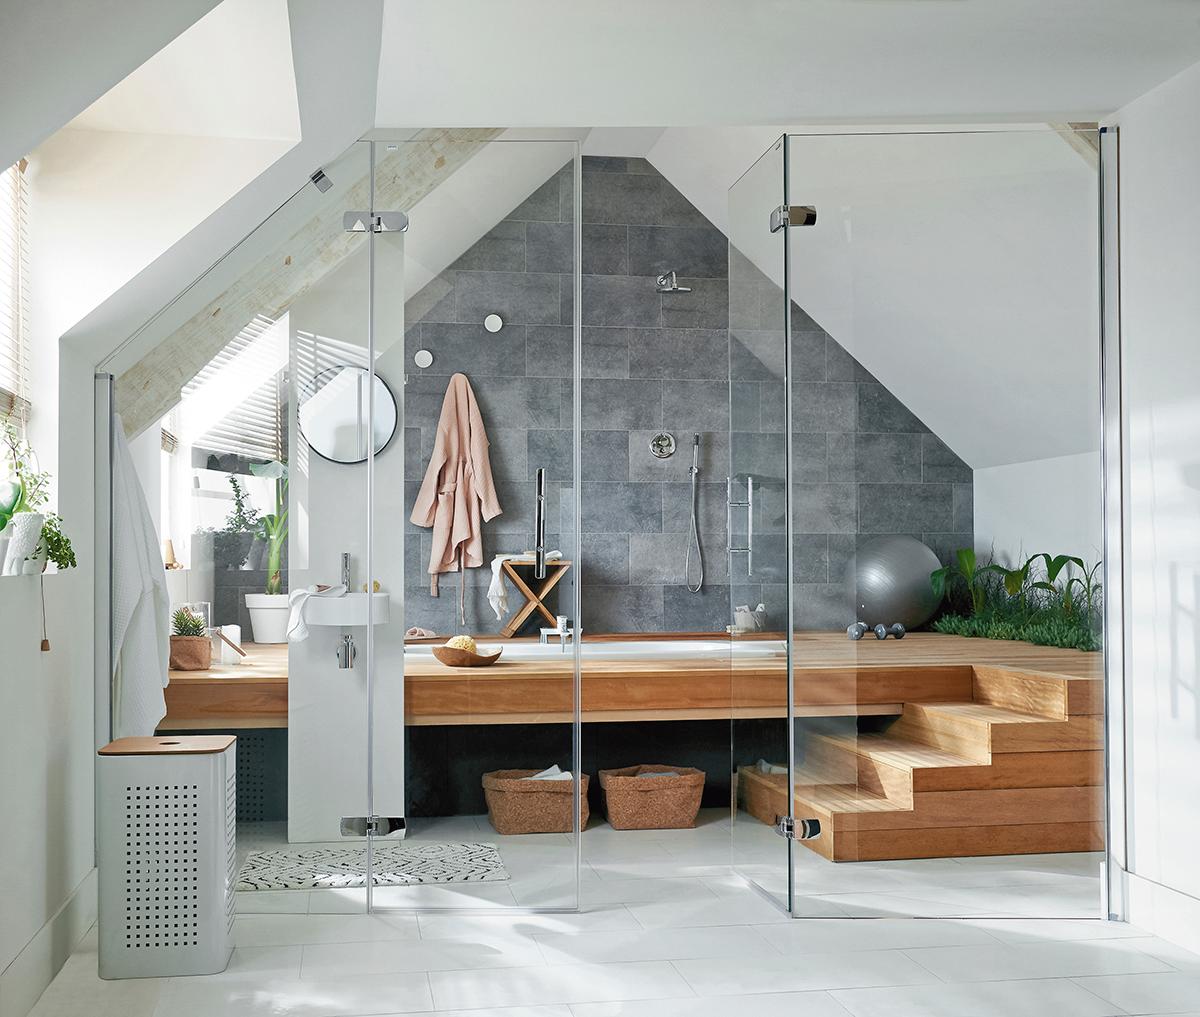 Installer Salle De Bains Combles un espace spa sous les combles. | salle de bains moderne